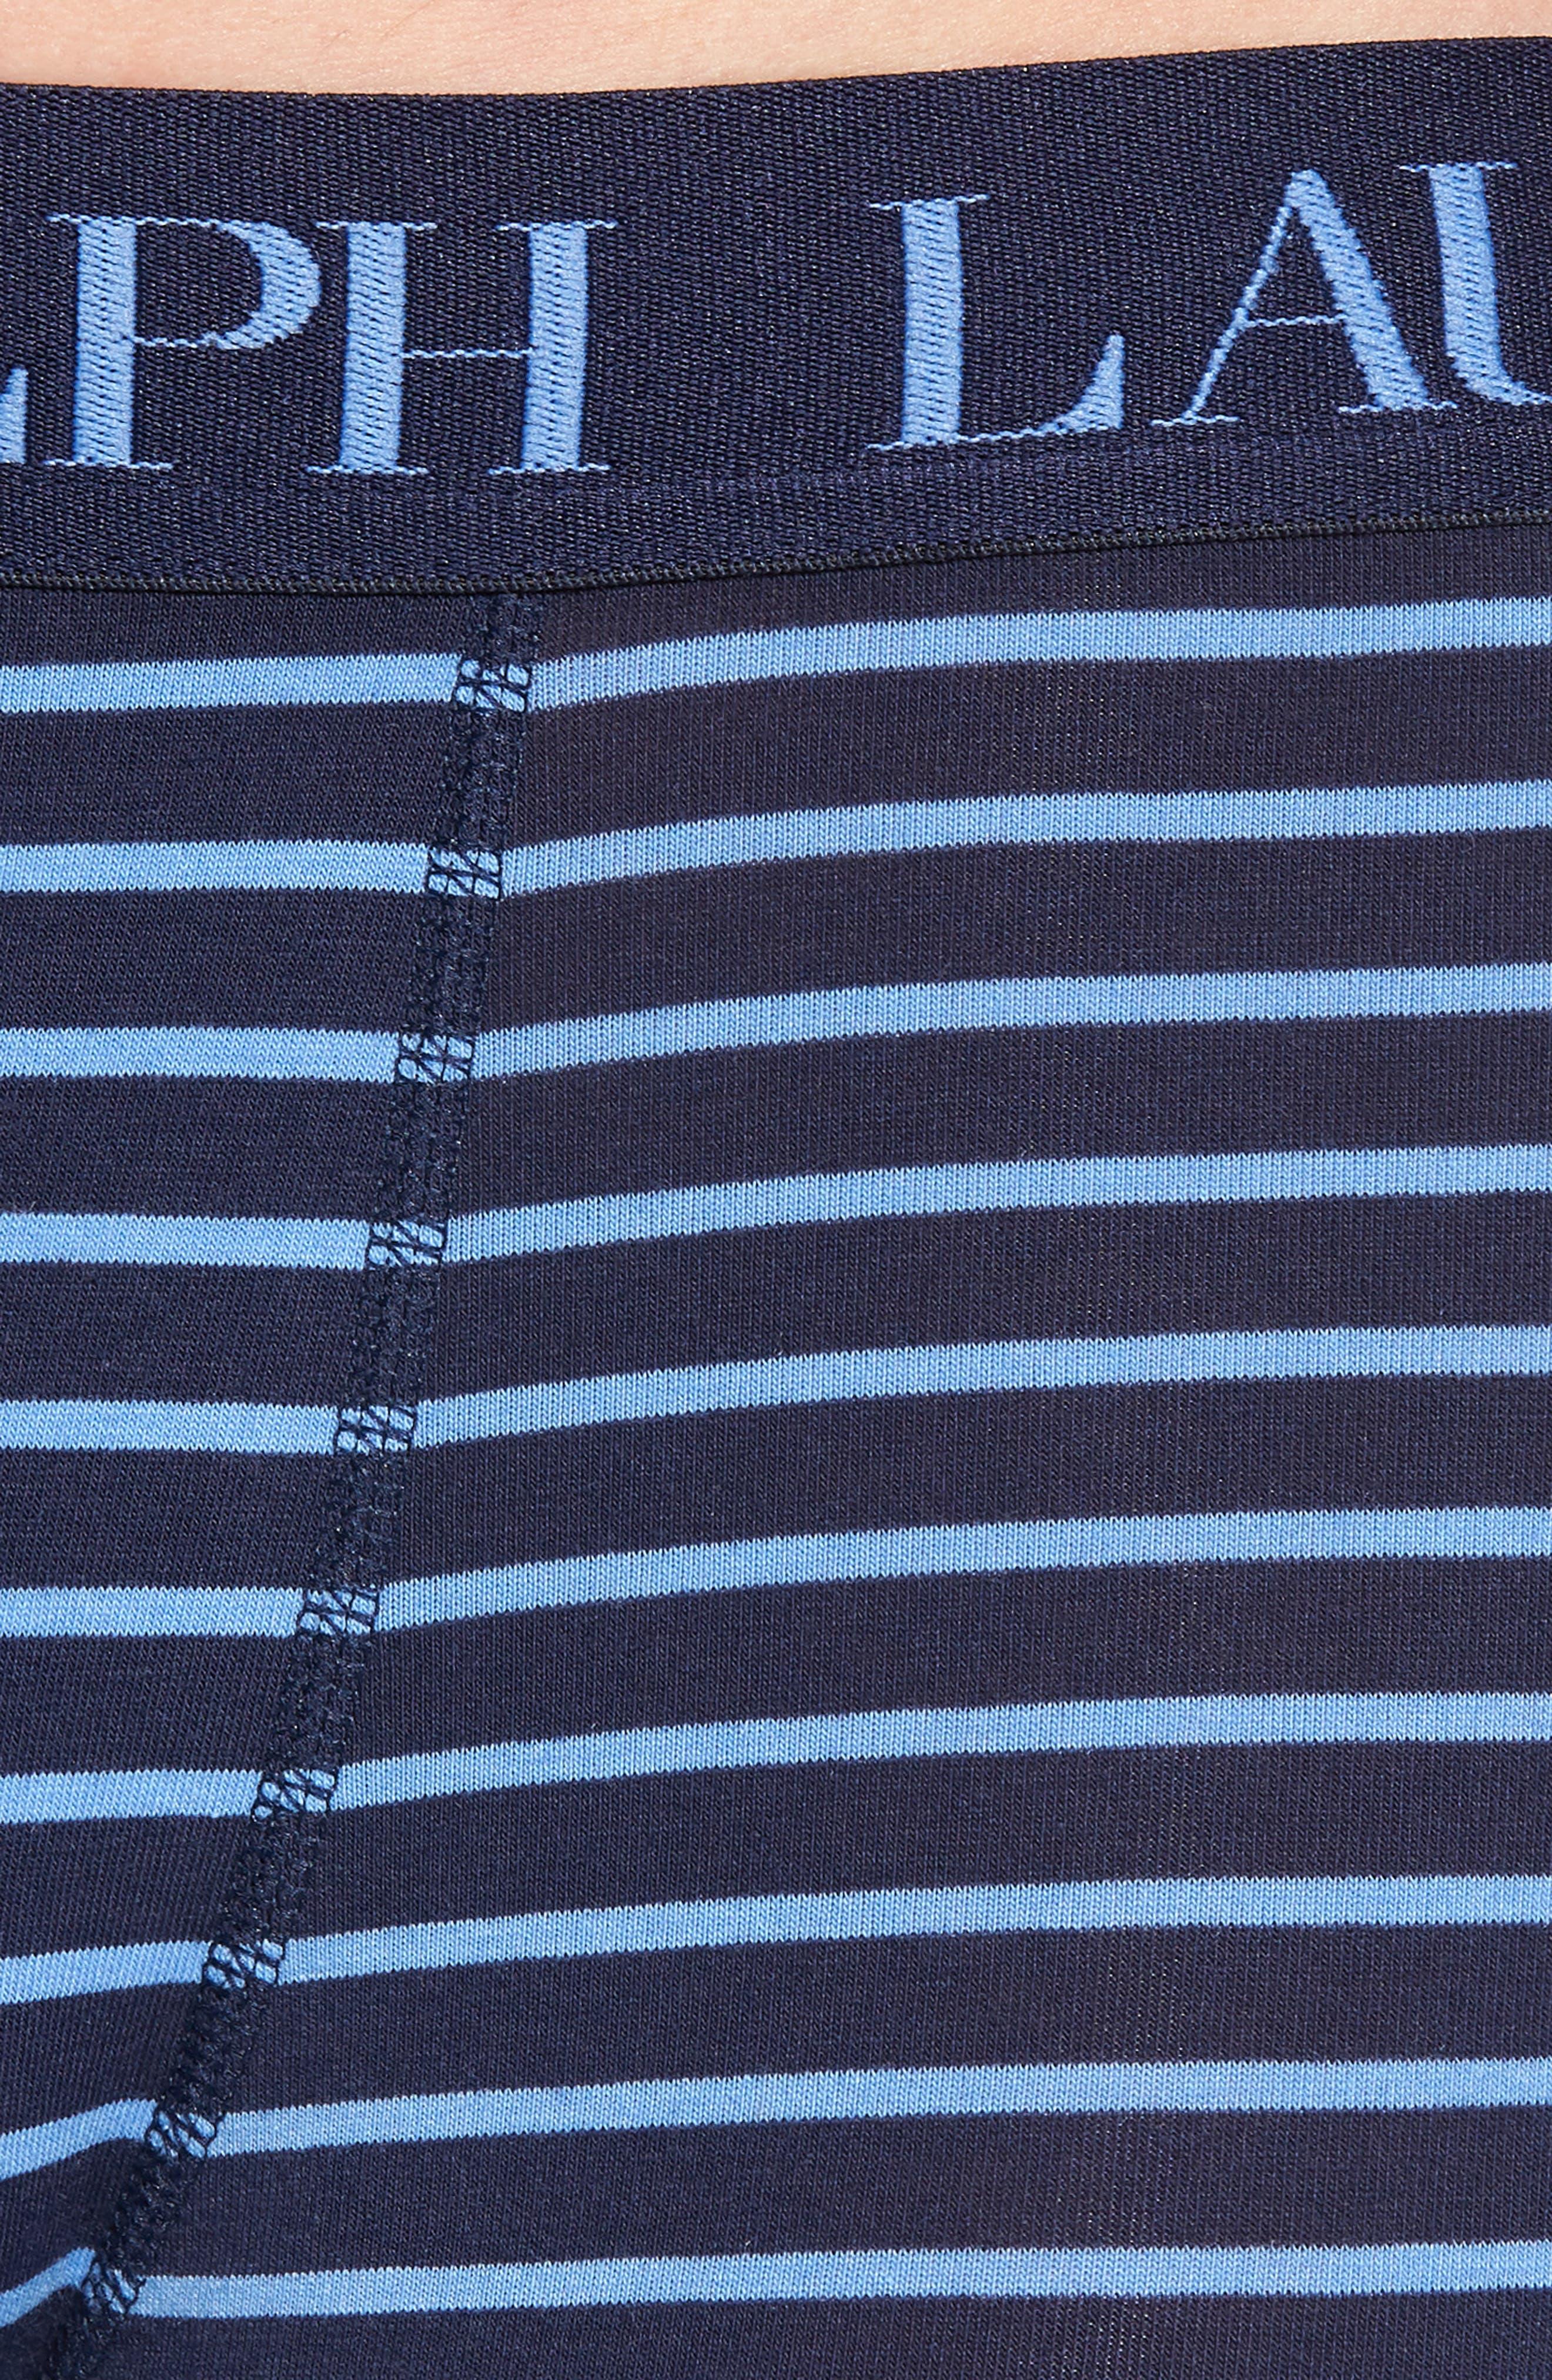 2-Pack Comfort Cotton Boxer Briefs,                             Alternate thumbnail 5, color,                             Cruise Navy/ Harbour Island